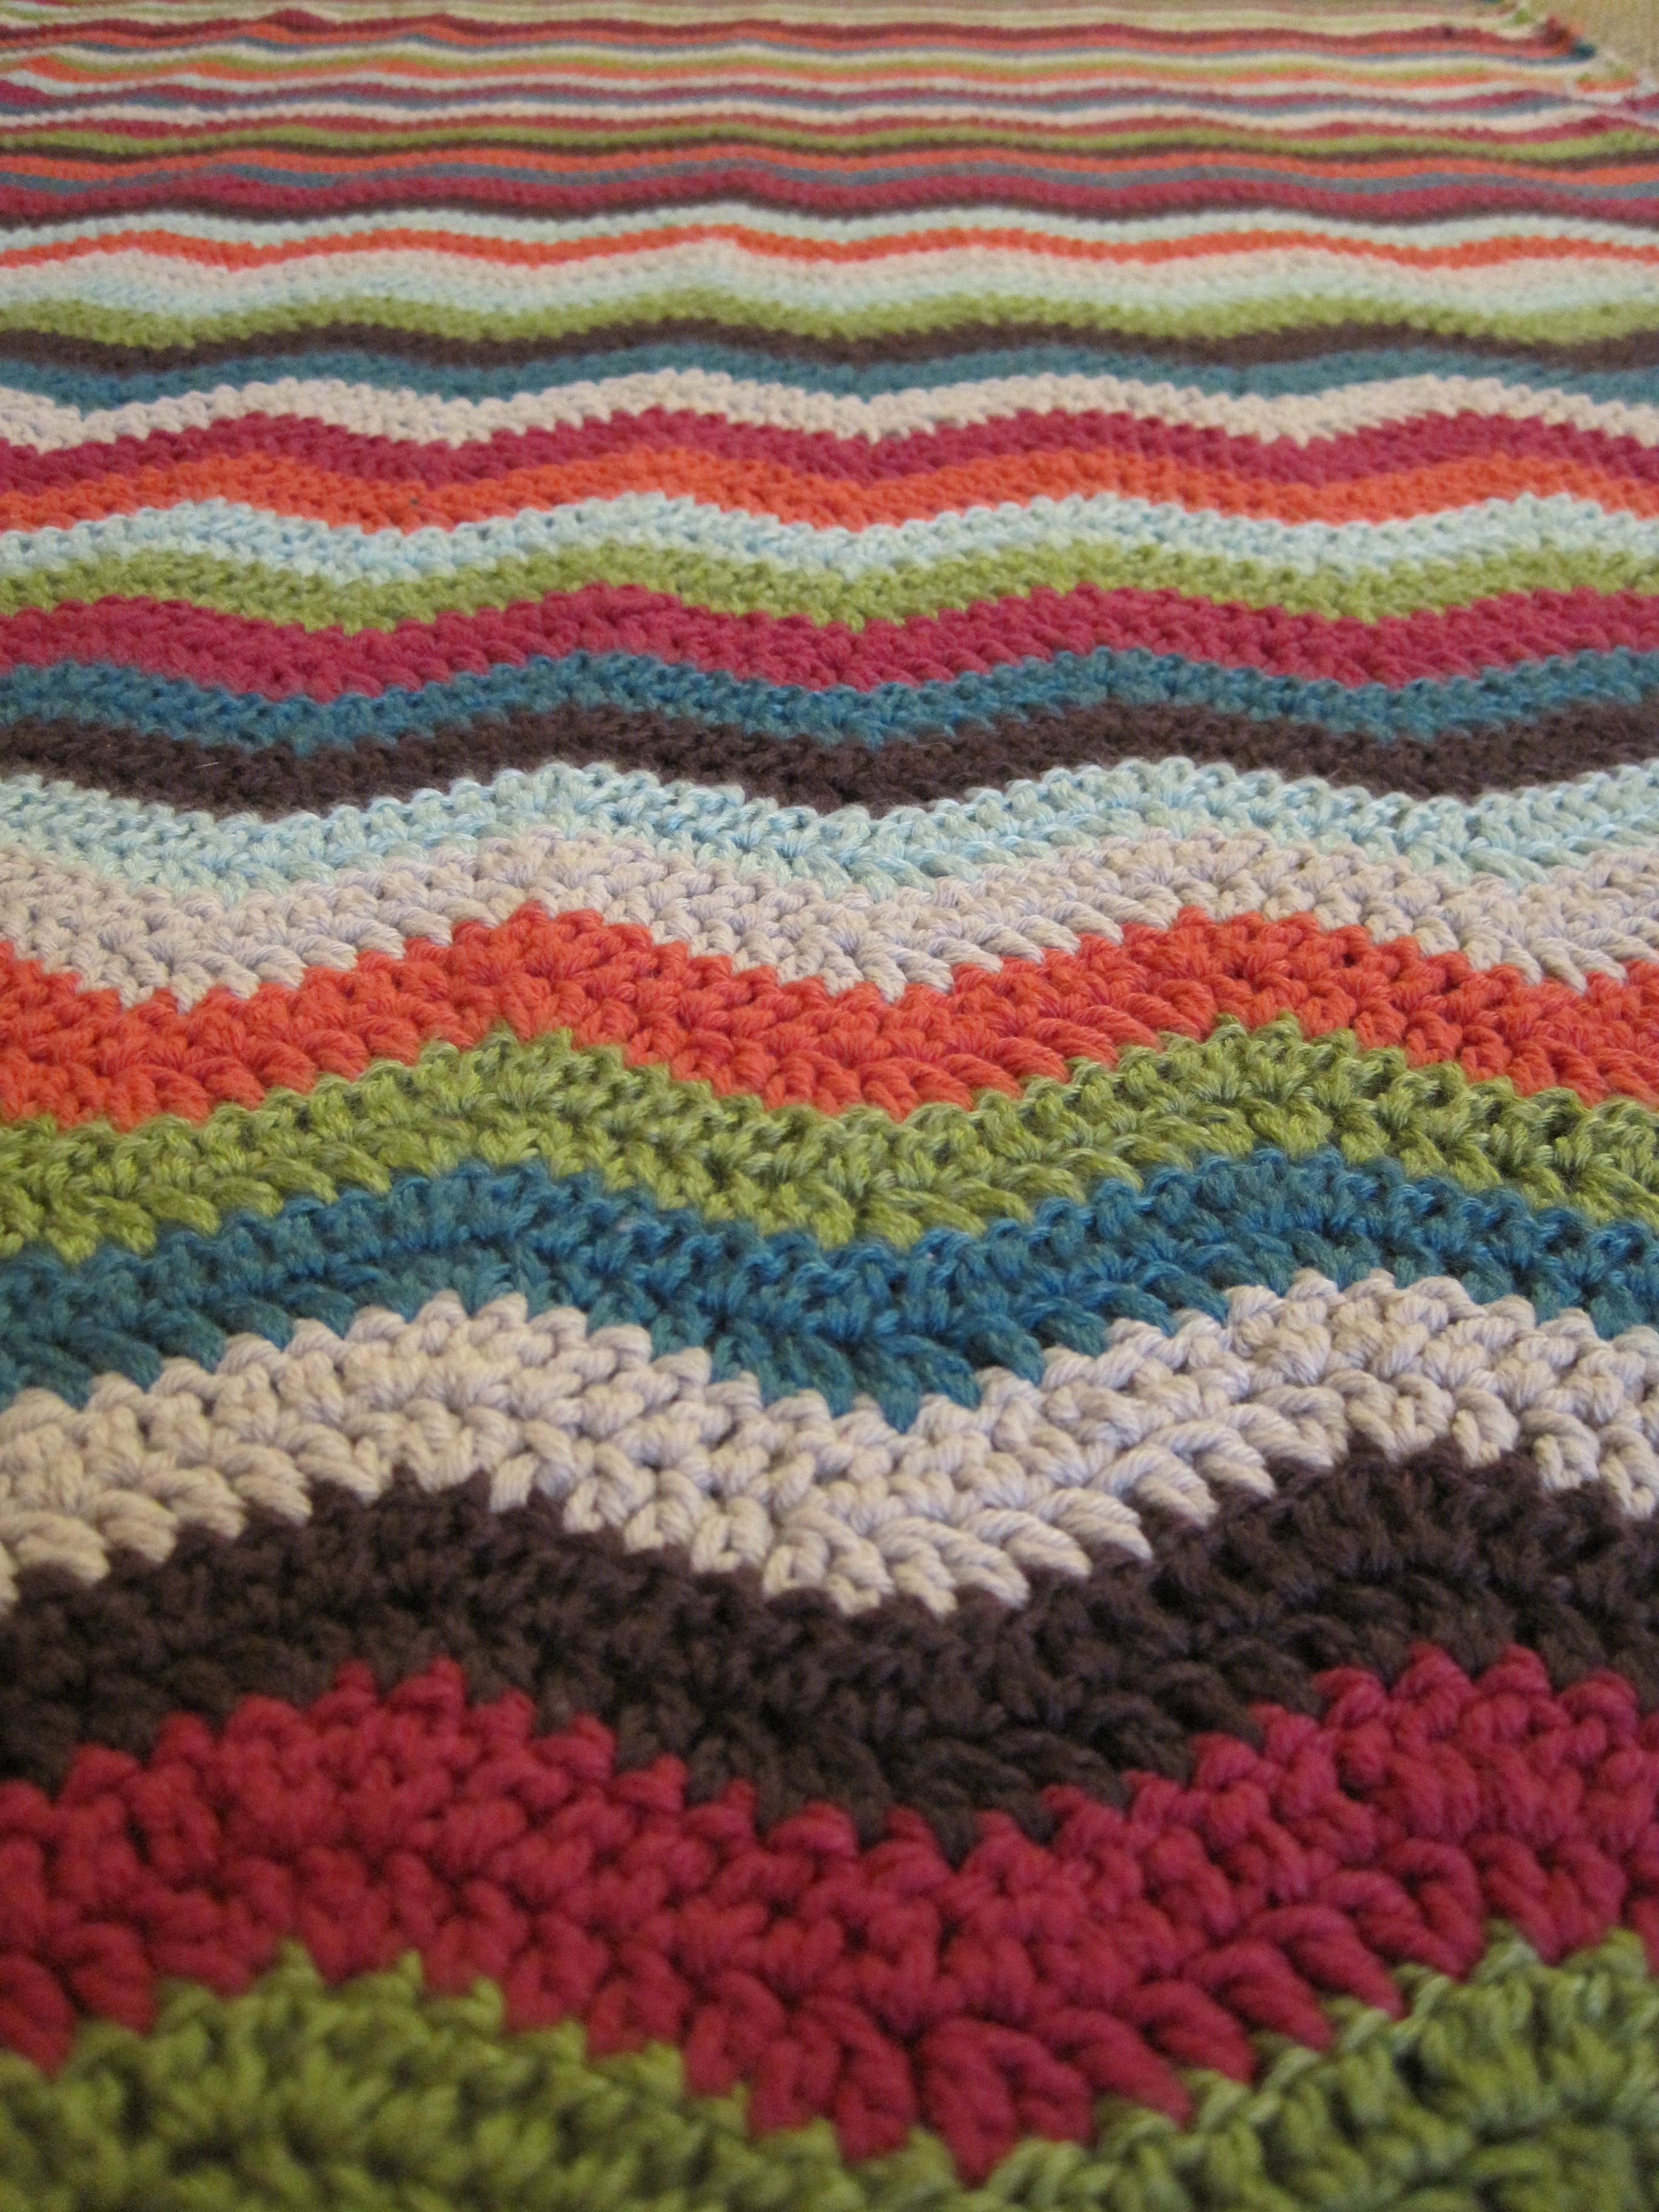 Crocheted ripple blanket My Gan has made us all so many blankets.